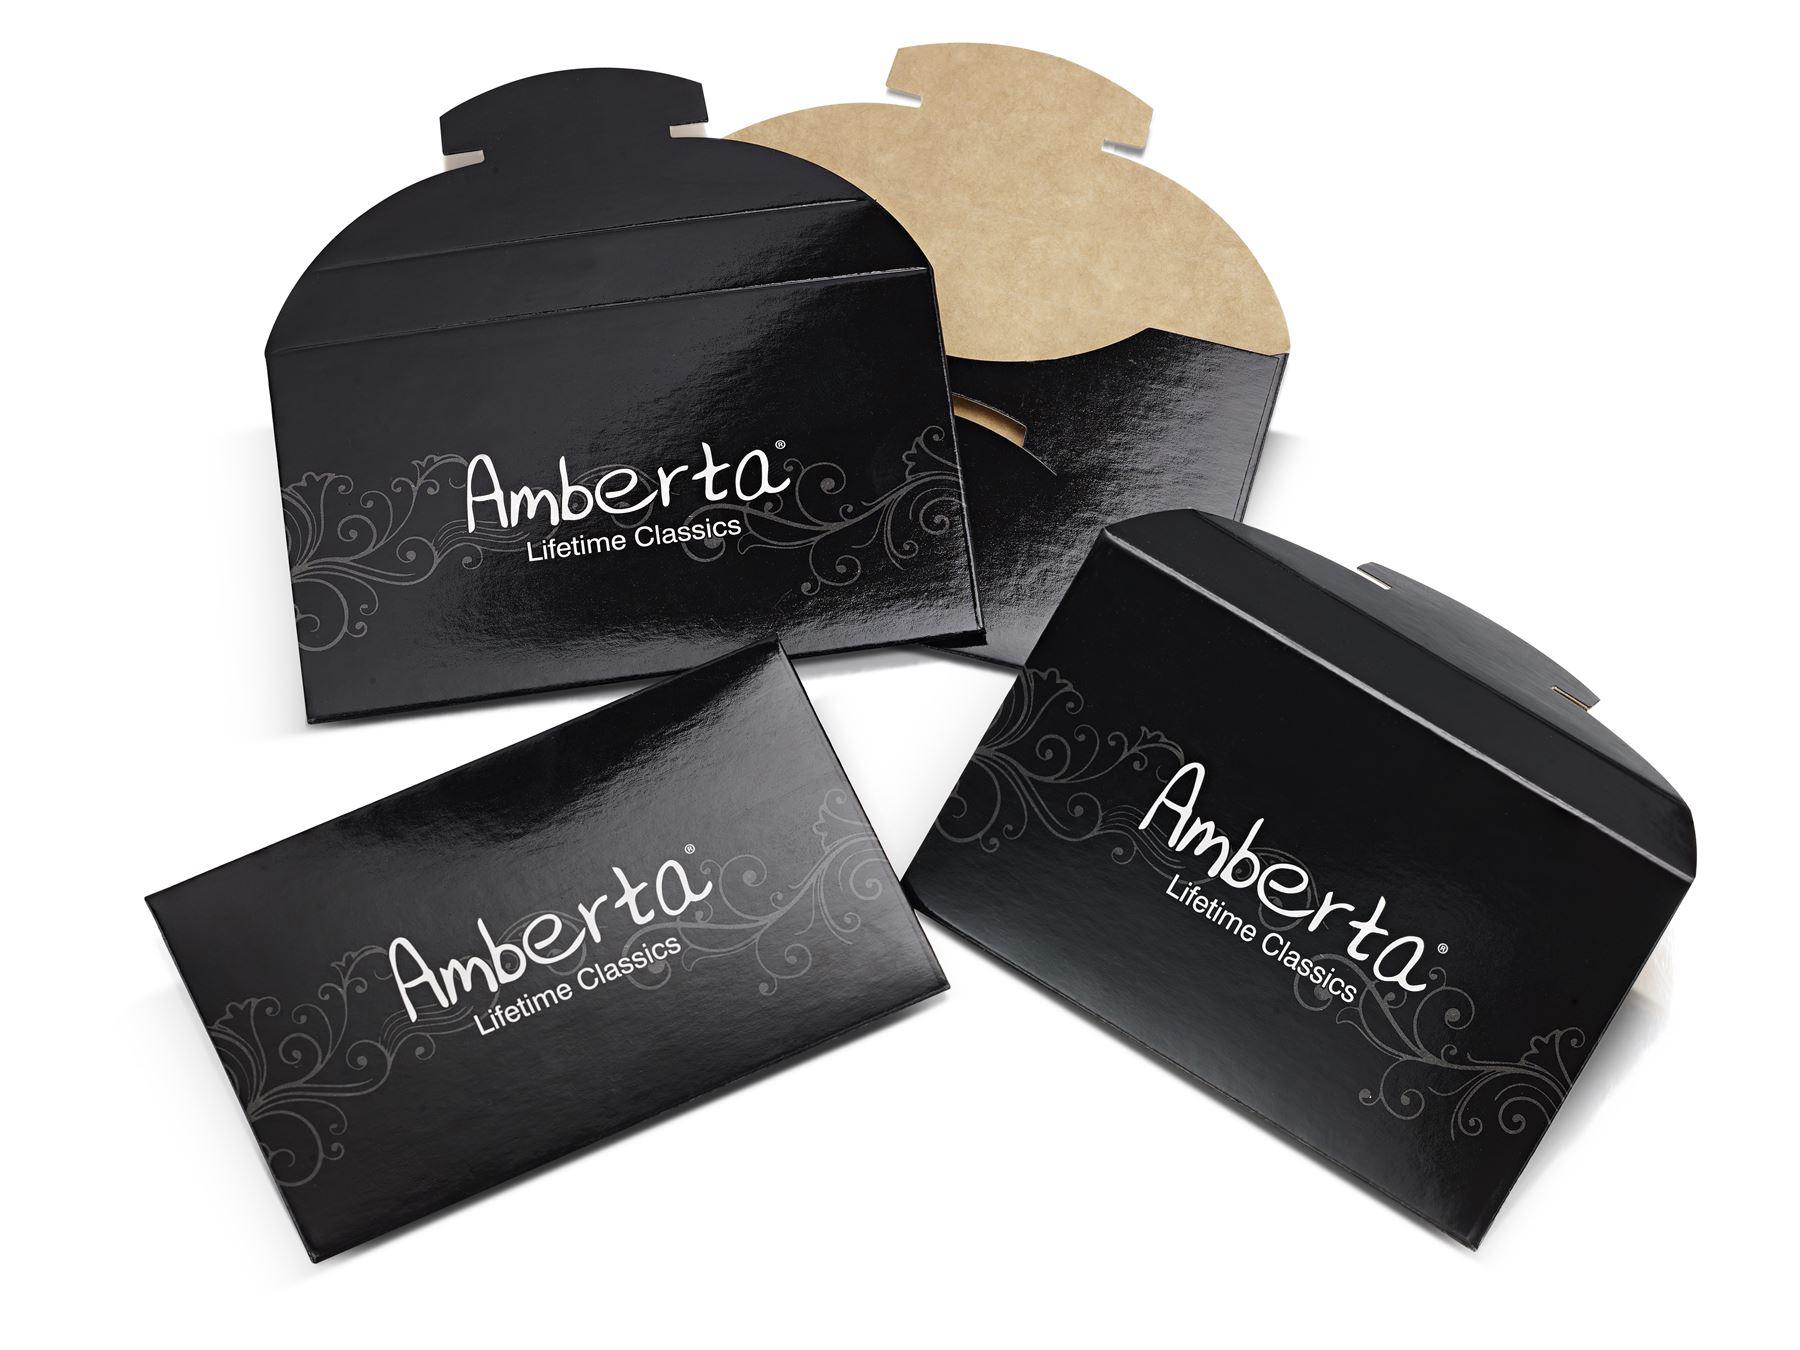 Amberta-Jewelry-925-Sterling-Silver-Adjustable-Bracelet-Italian-Bangle-for-Women thumbnail 28